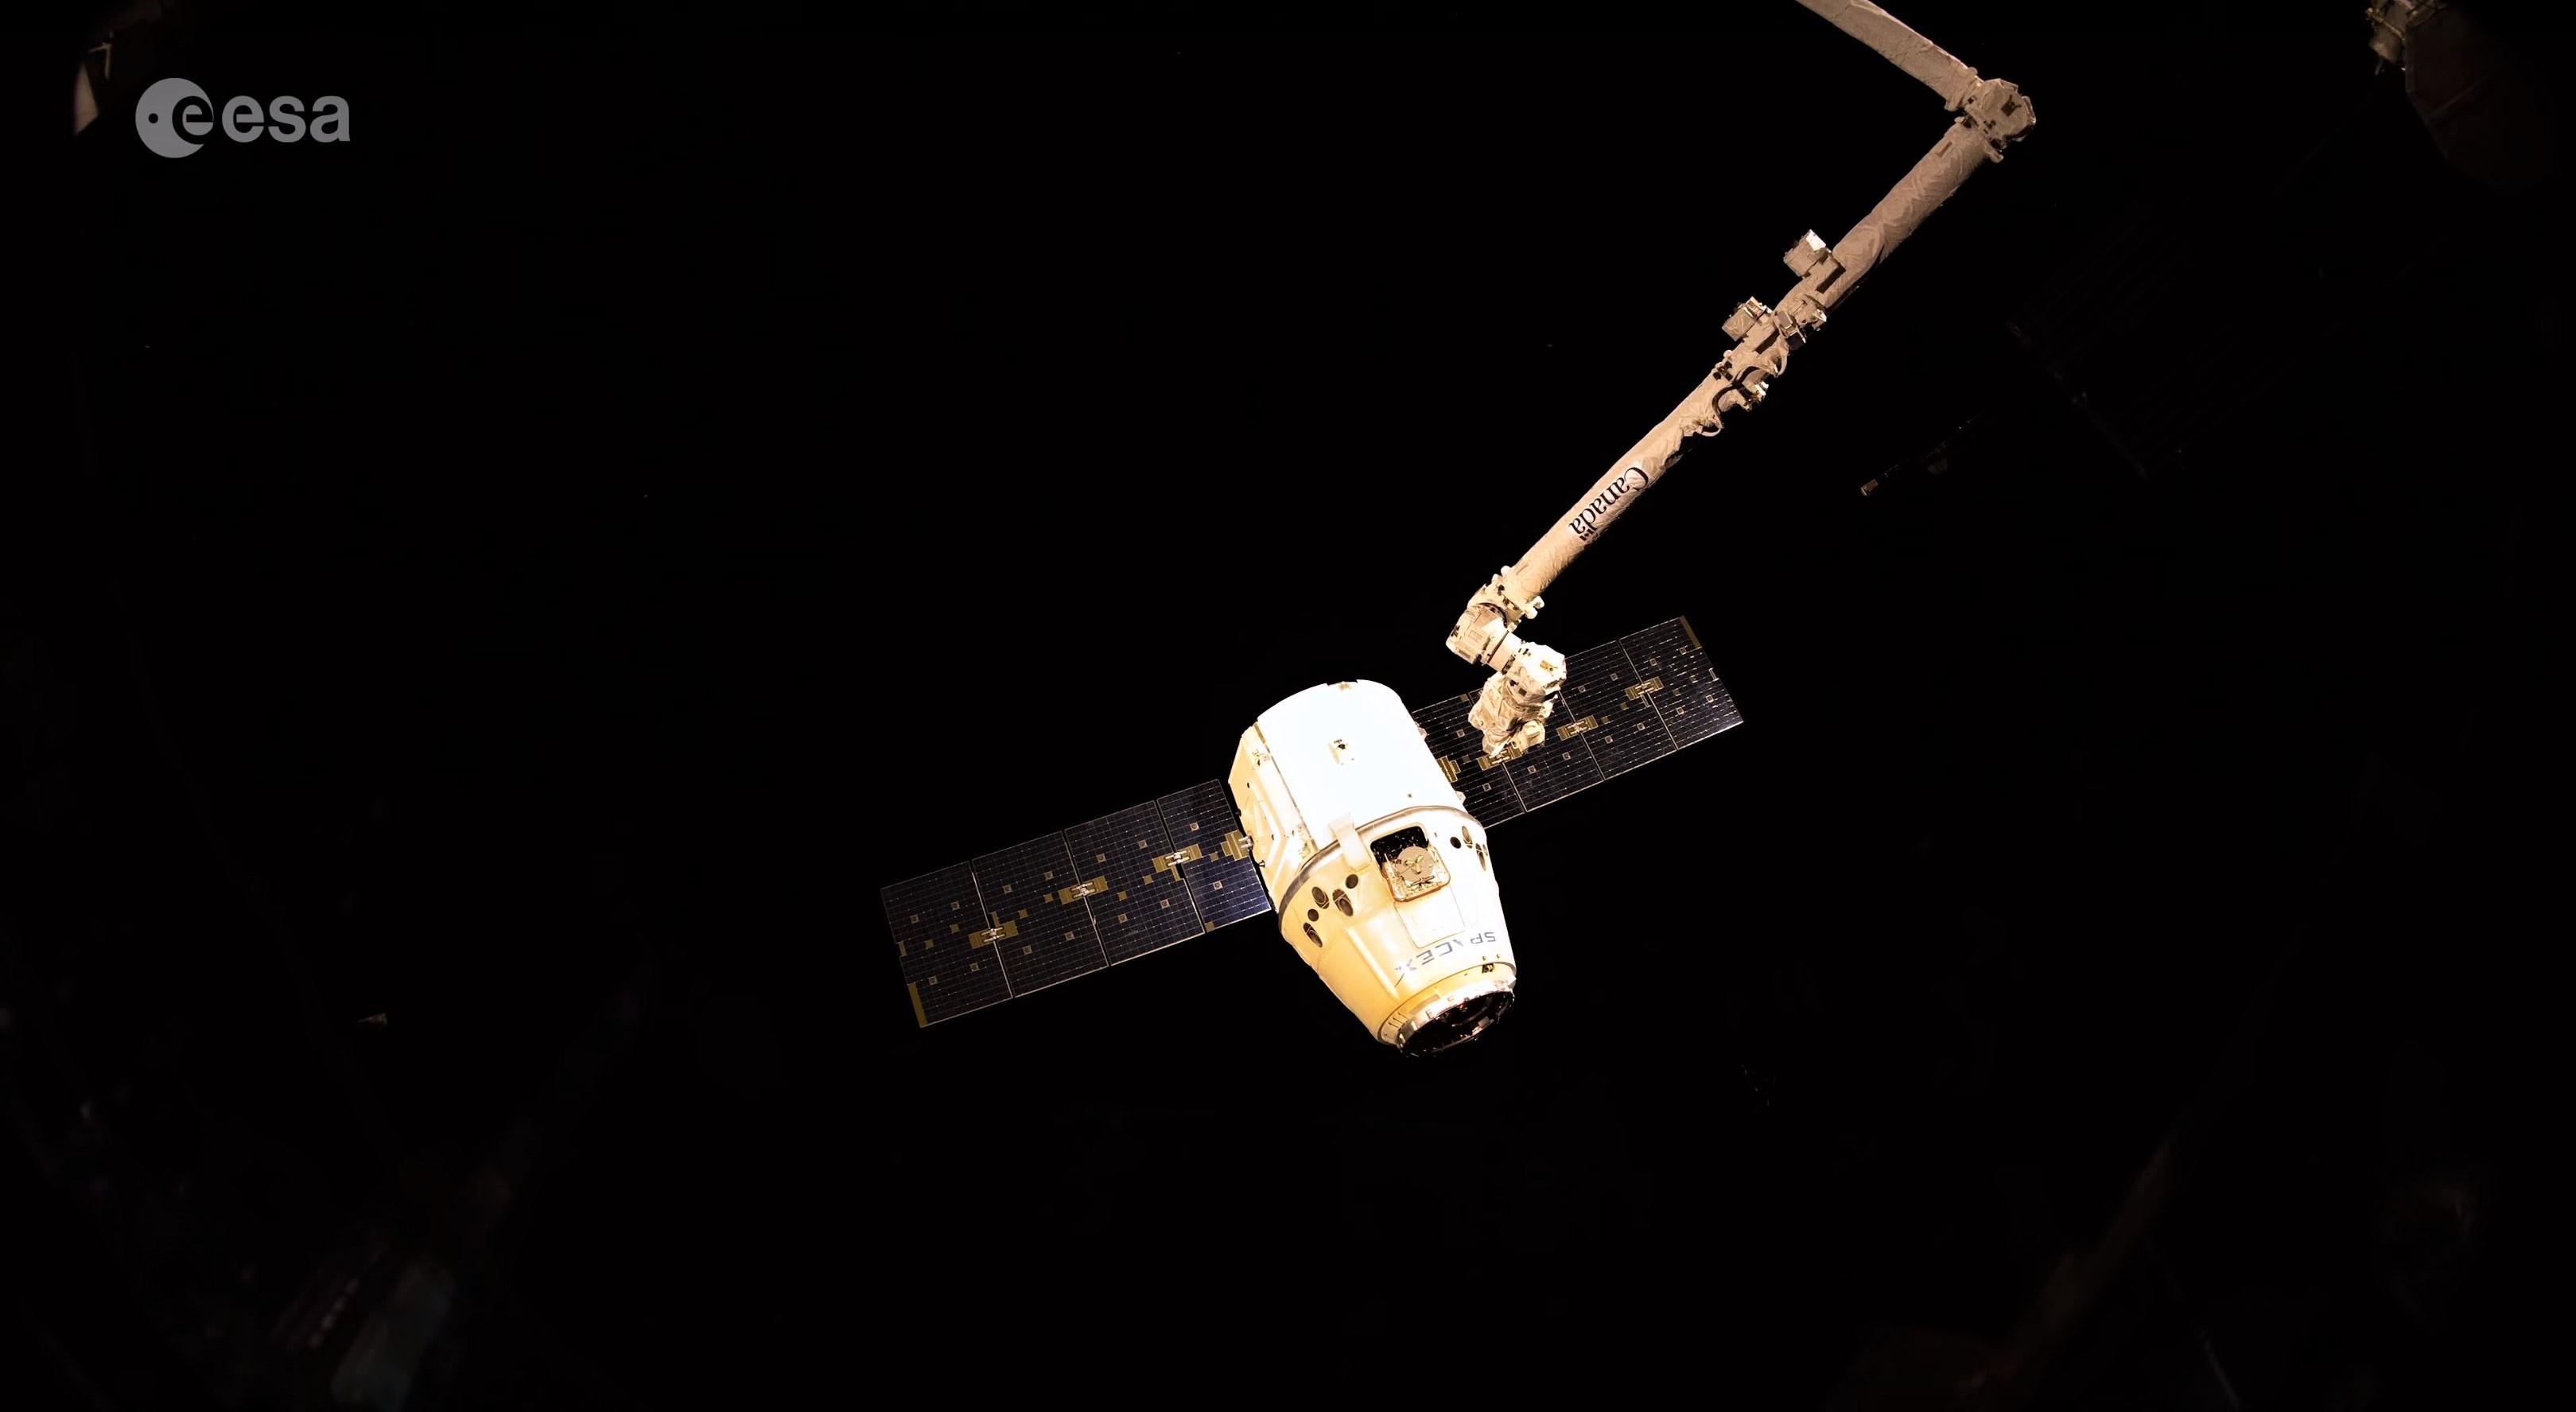 CRS-15 departure 4K (ESA) 9